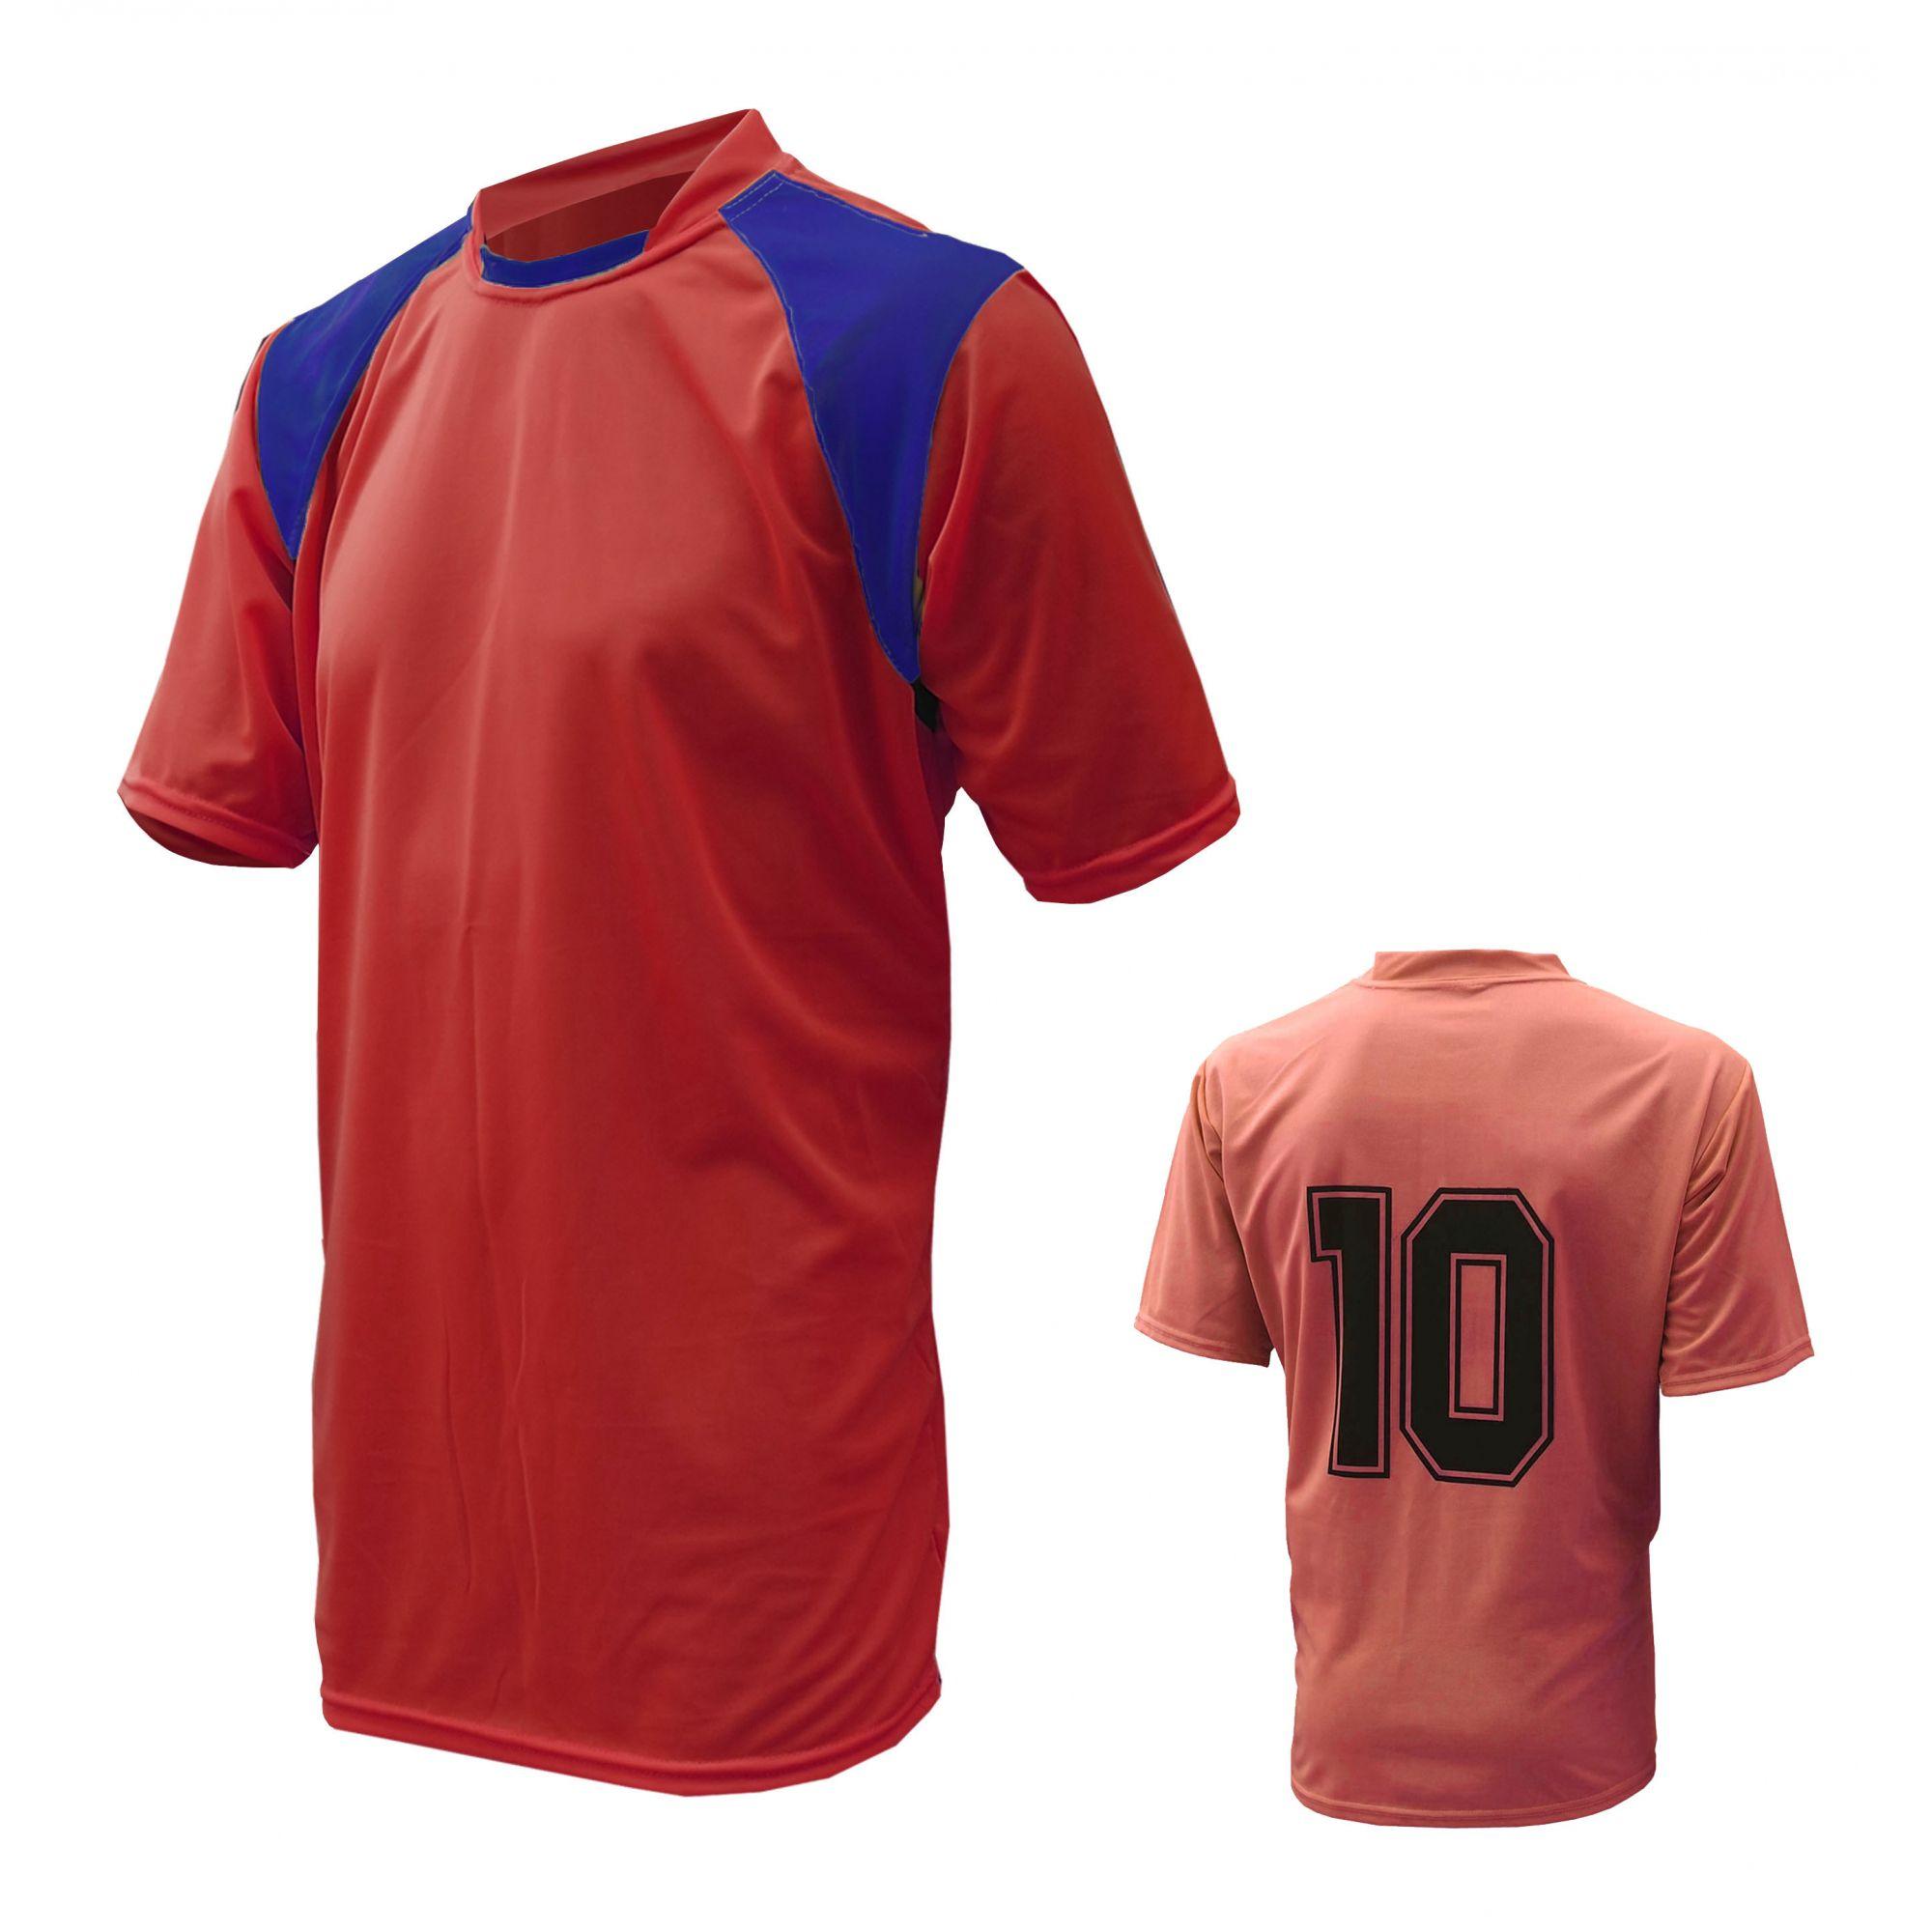 Camisa de Futebol Avante